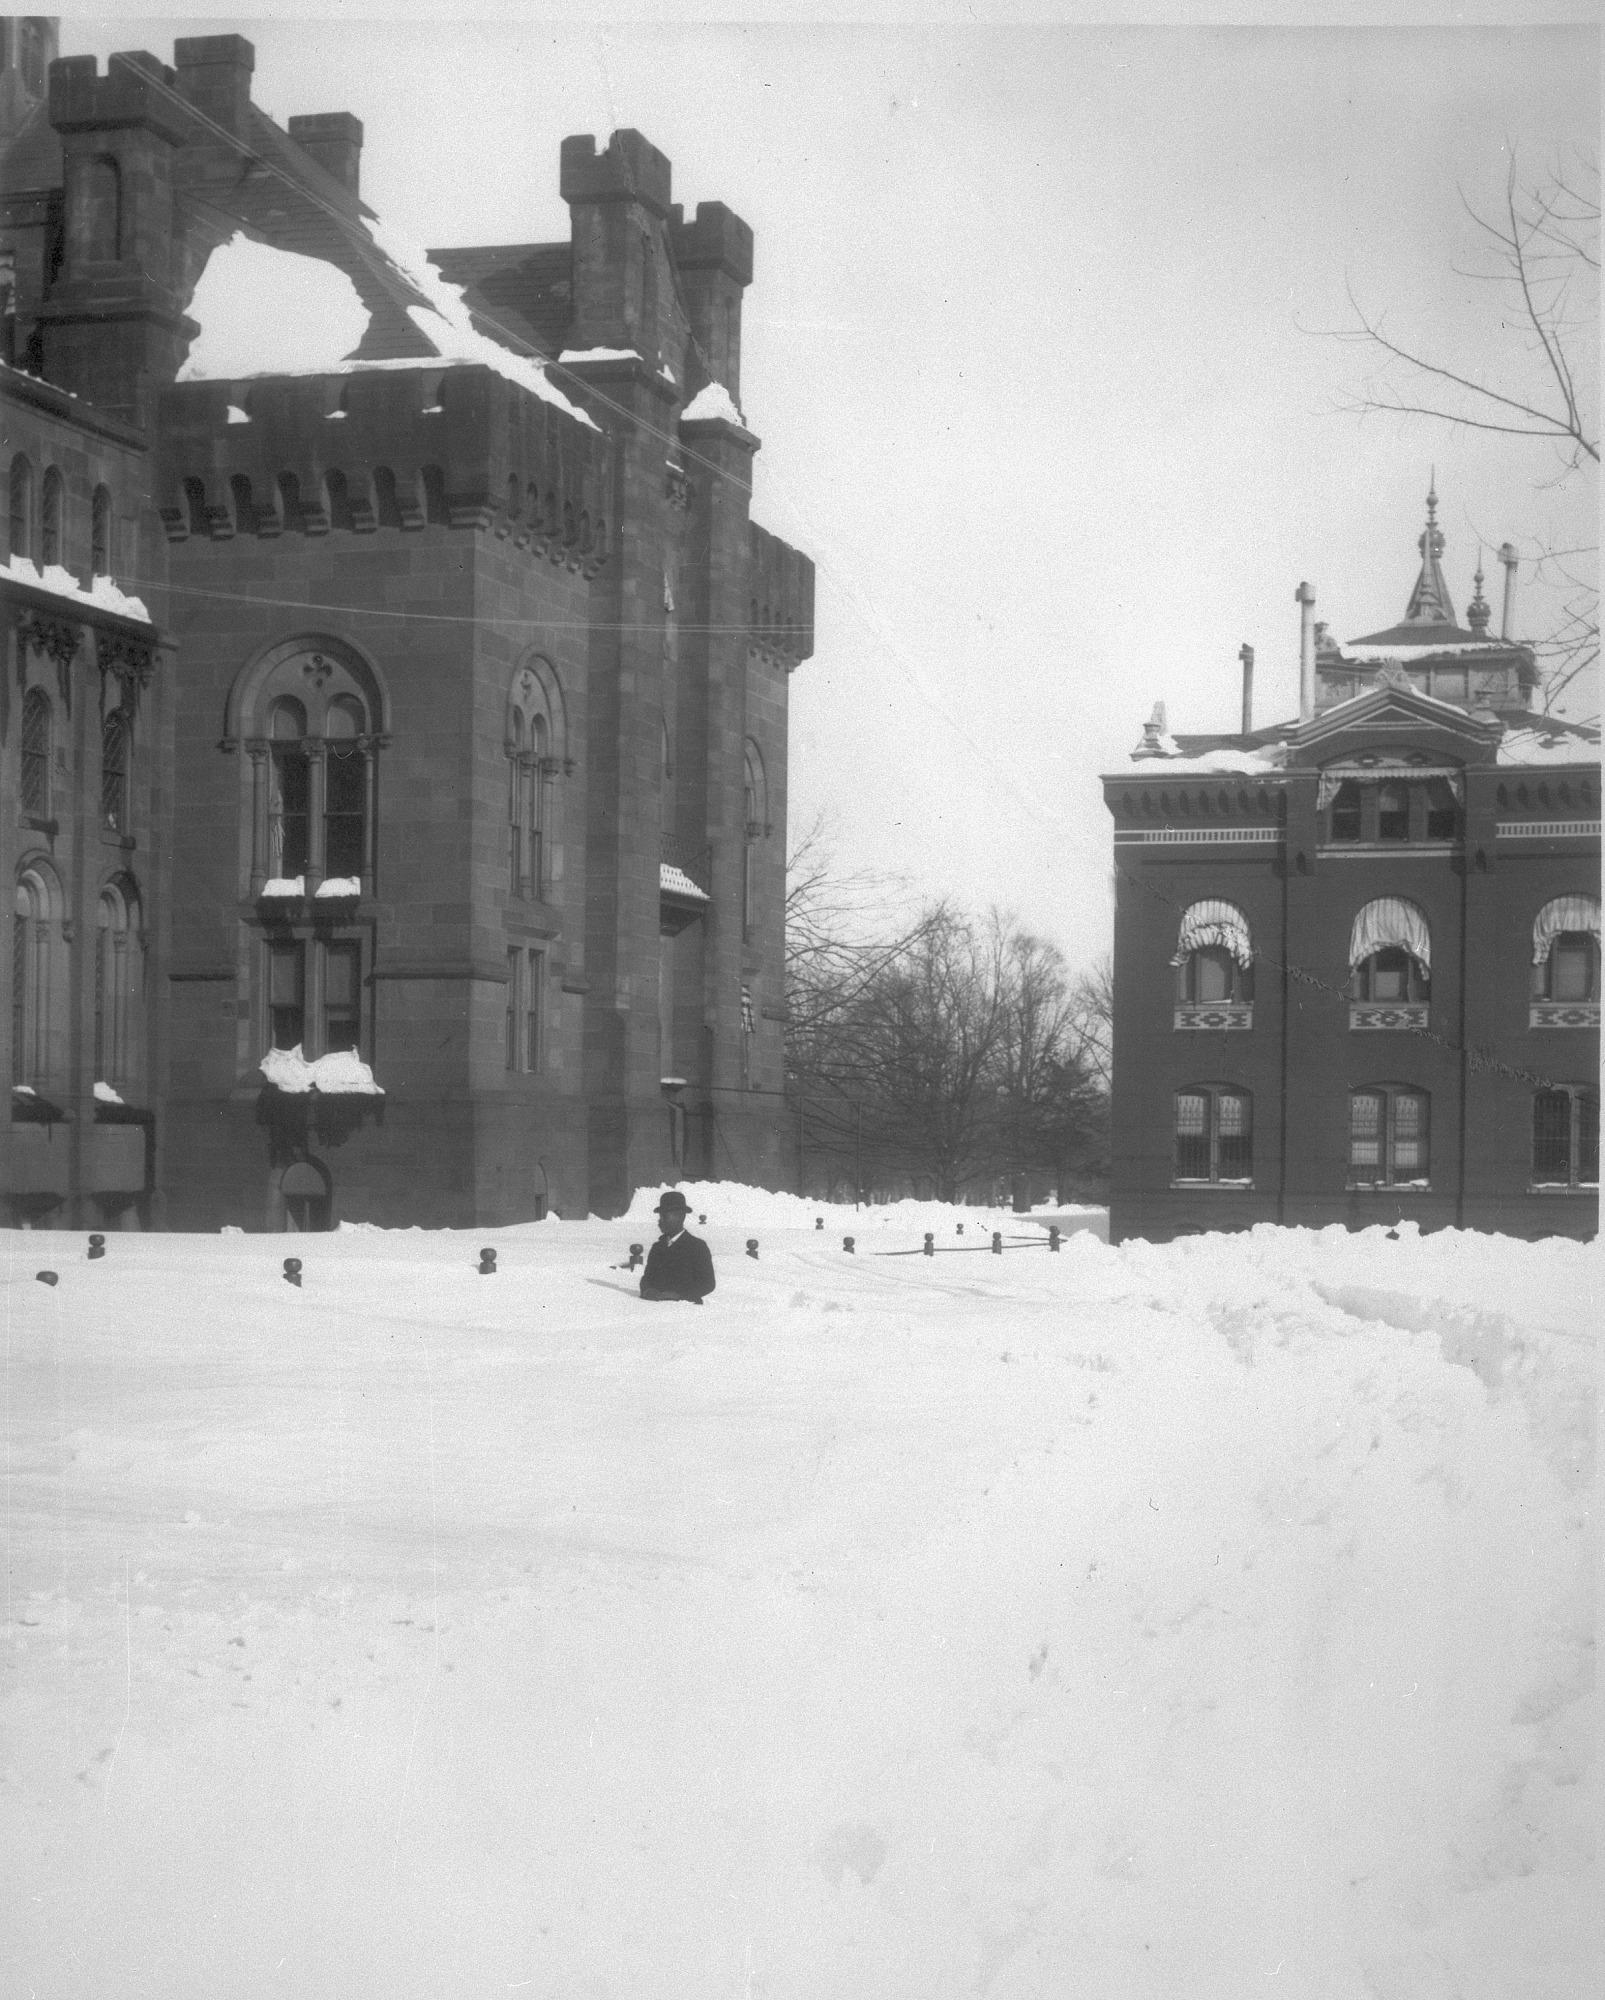 Knickerbocker Snowstorm Hits Washington, D.C, January 29, 1922, Smithsonian Archives - History Div.